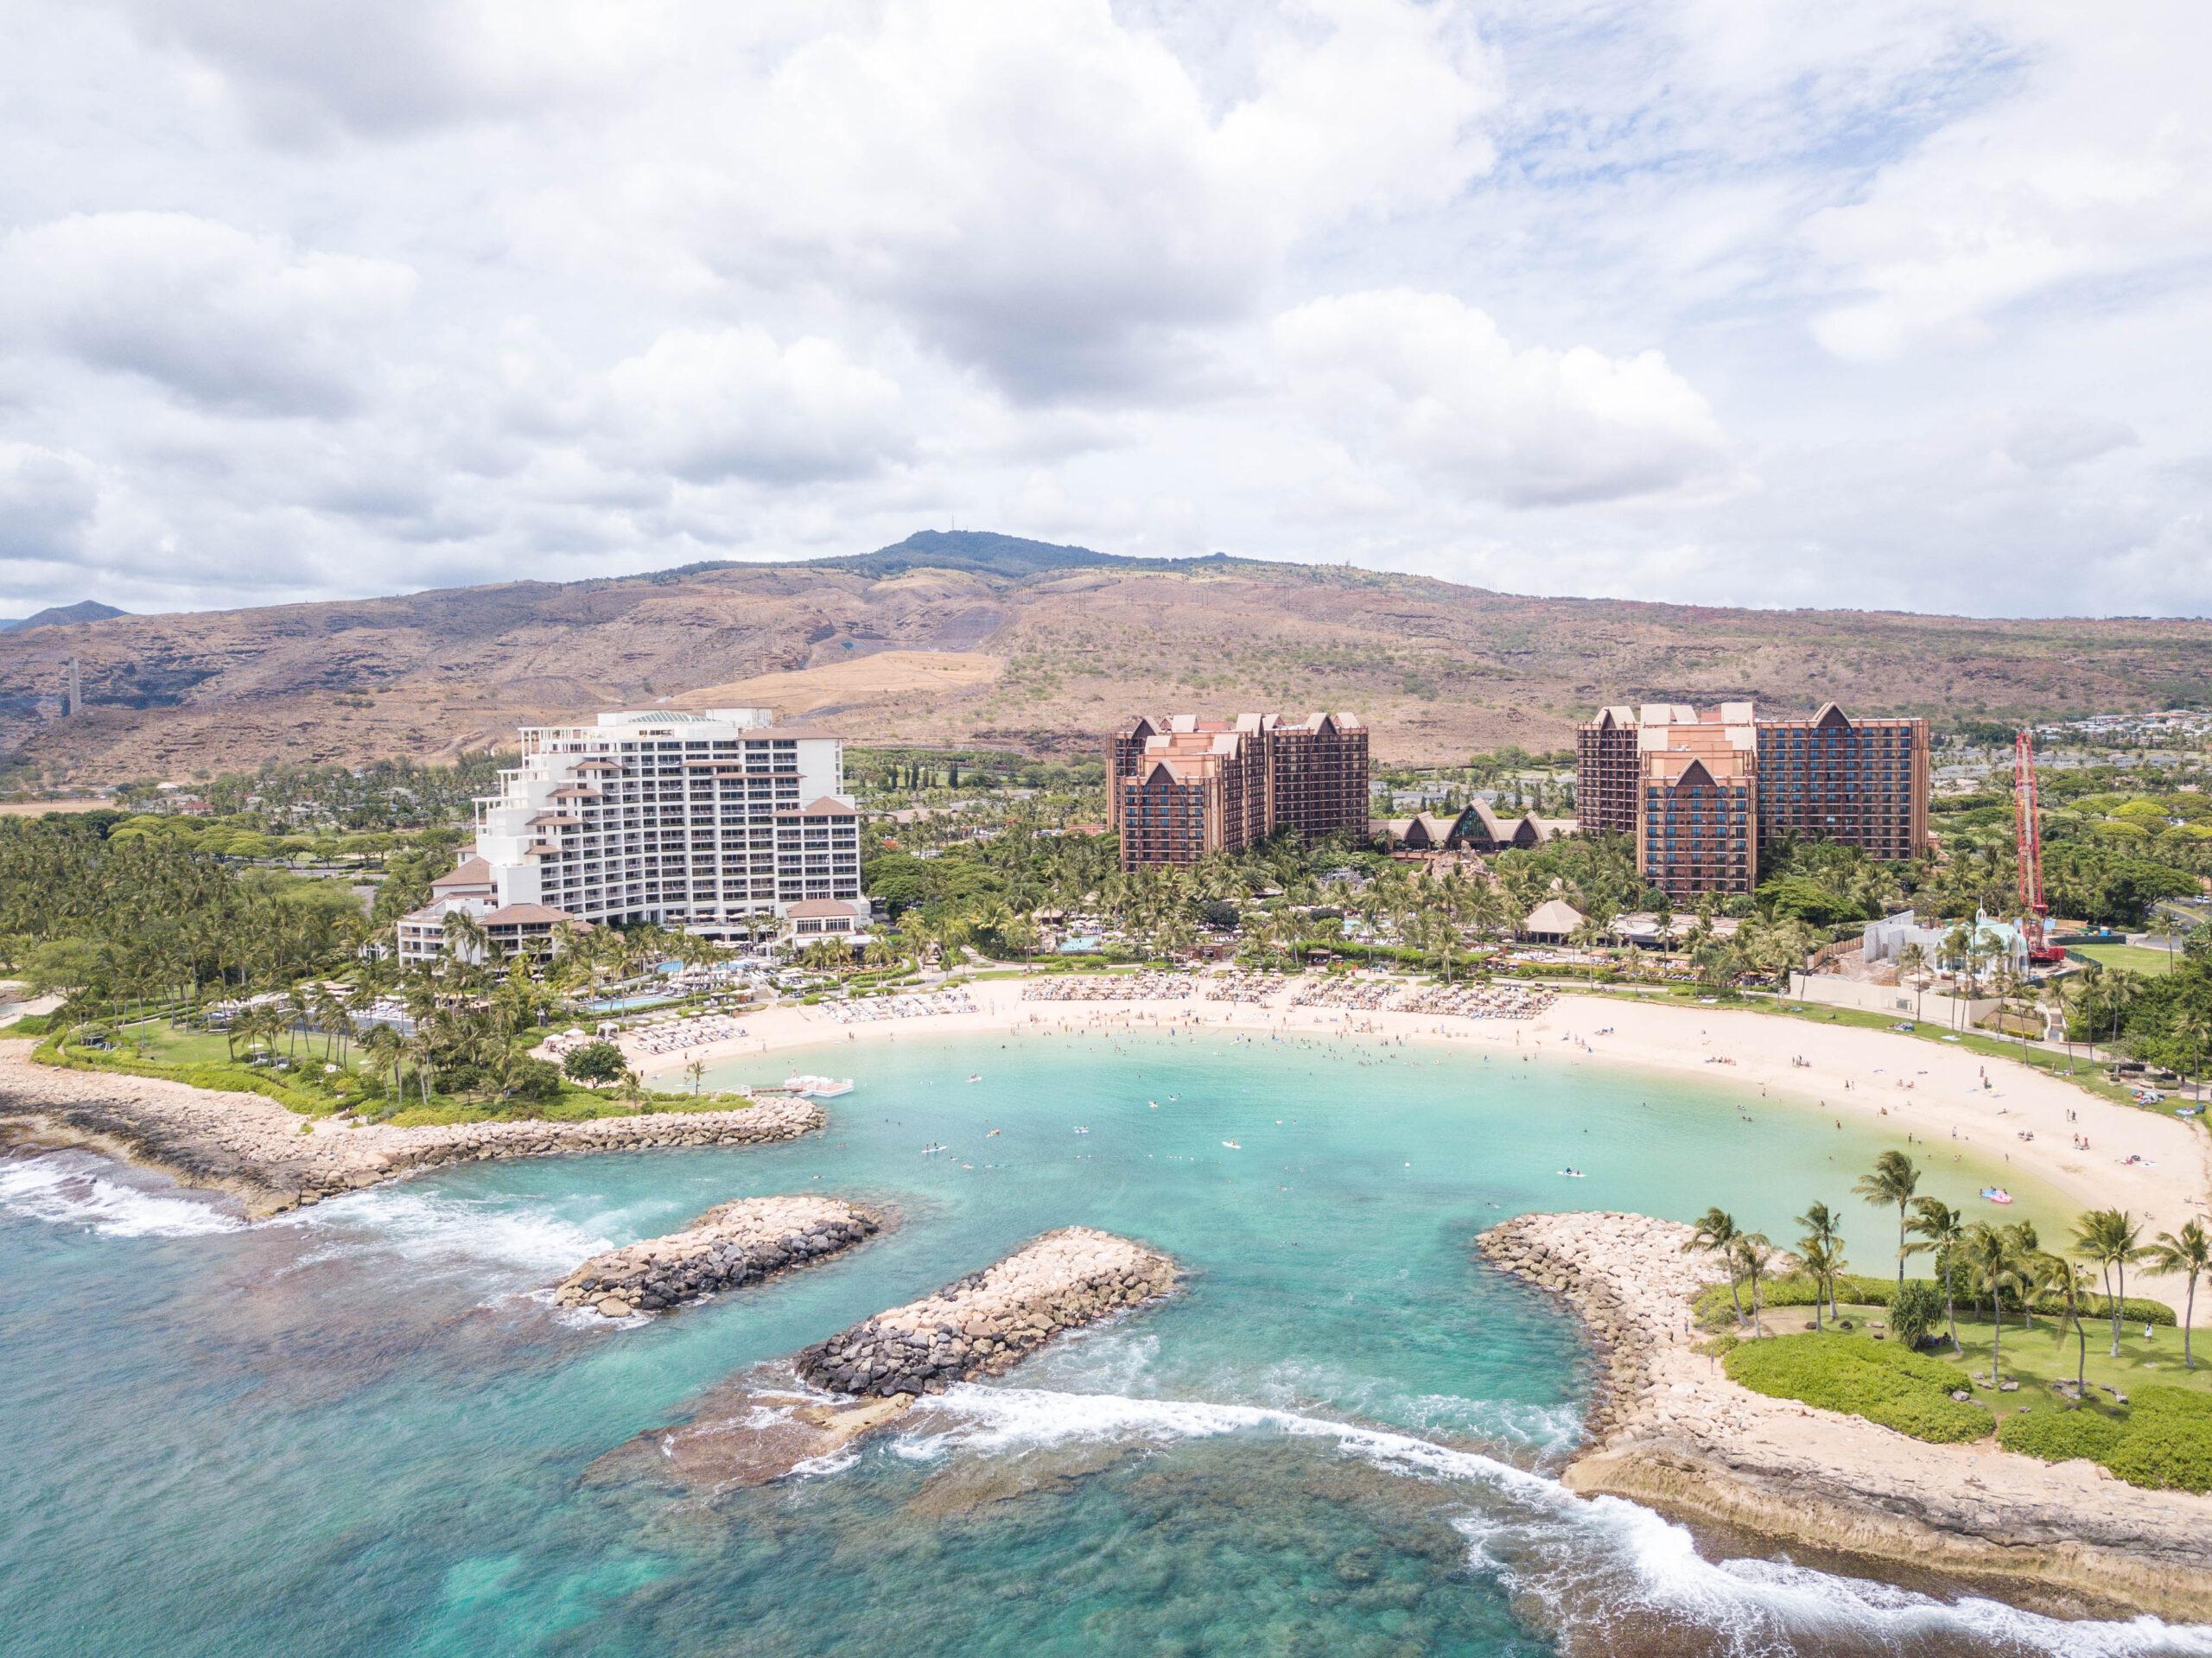 Ko Olina Hawaii - Four Seasons and Disney Aulani